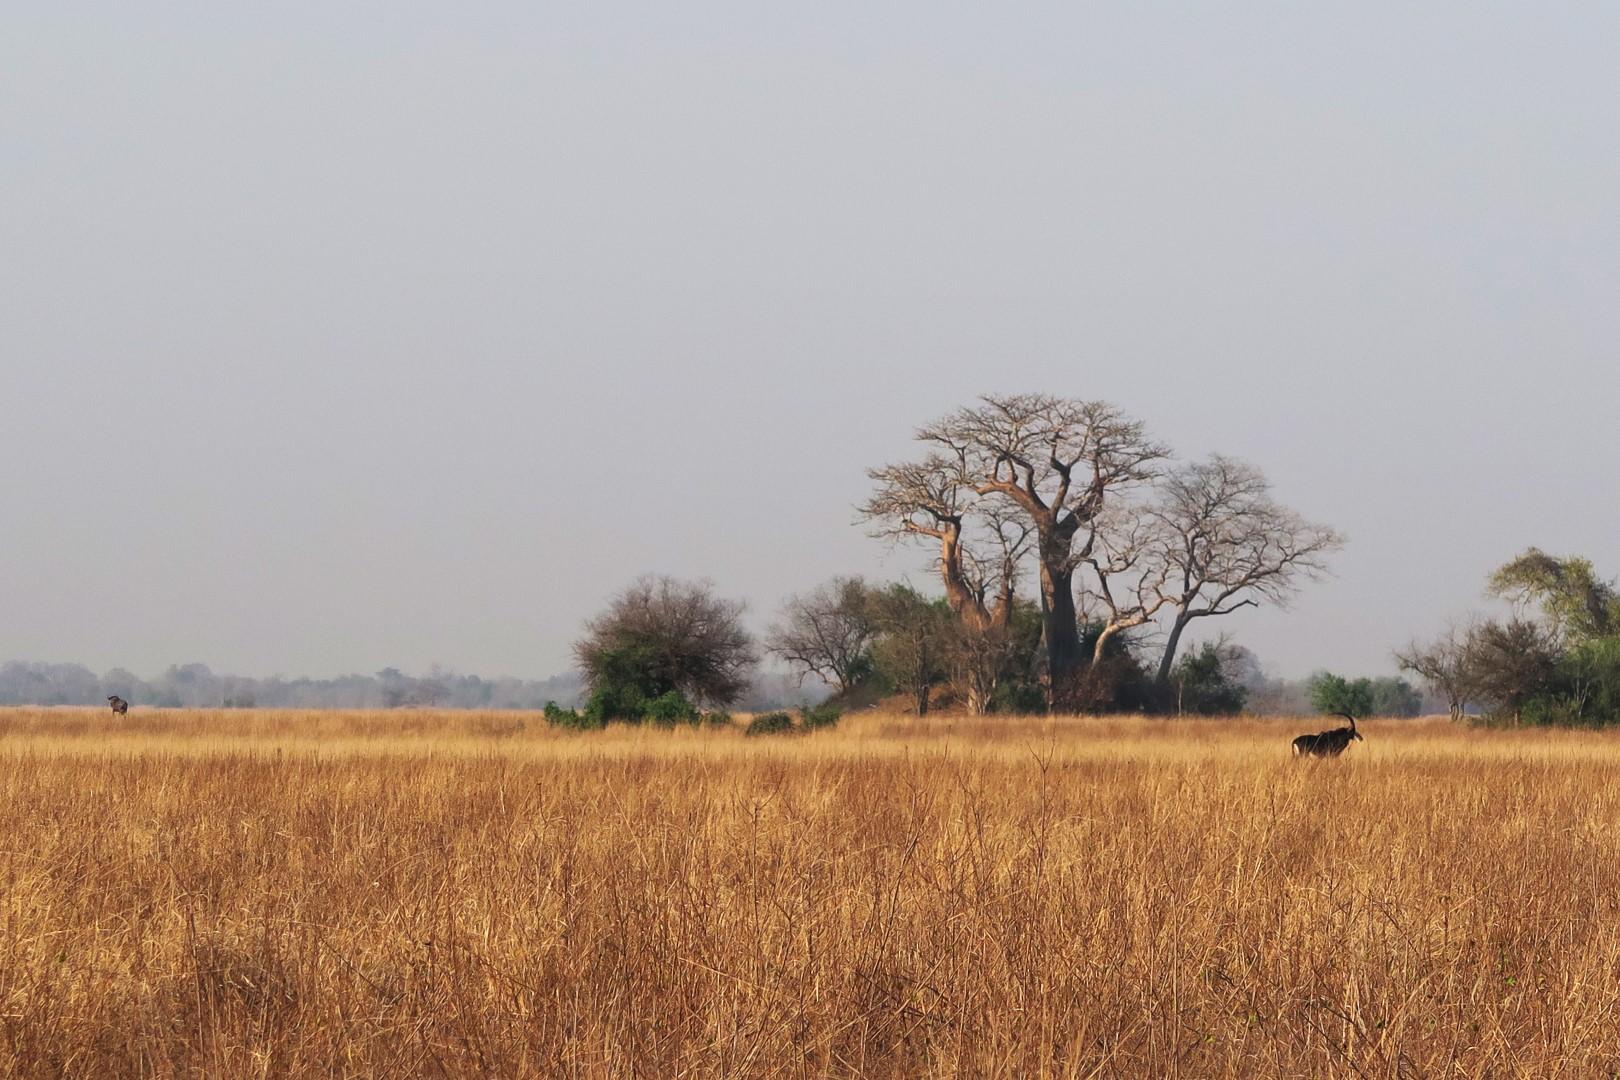 Savanna and Baobab Trees